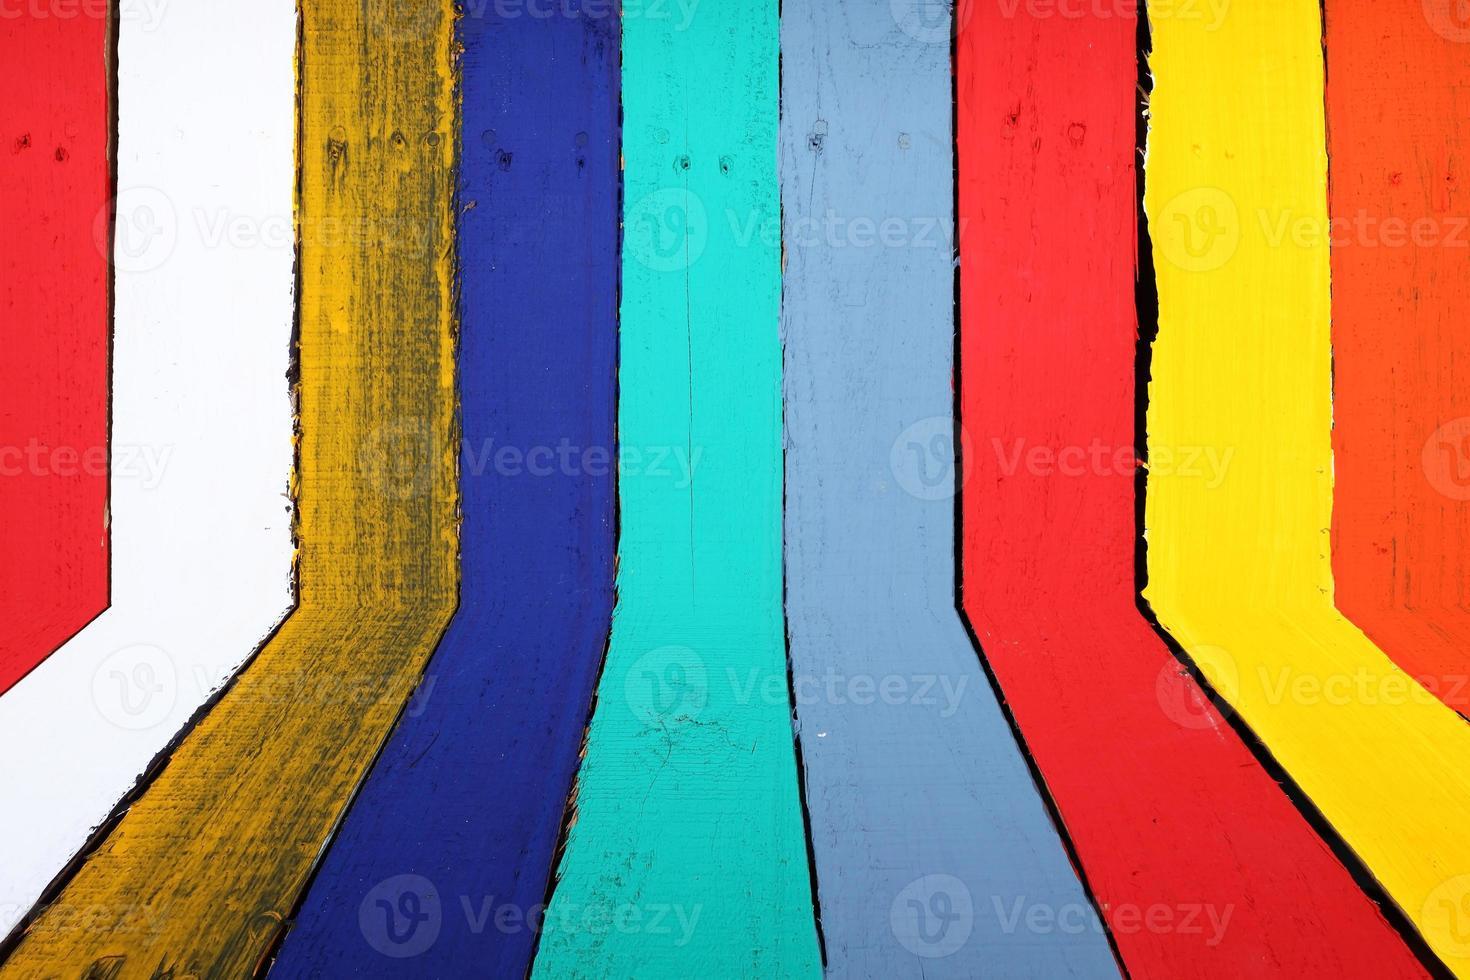 parede em perspectiva colorida foto